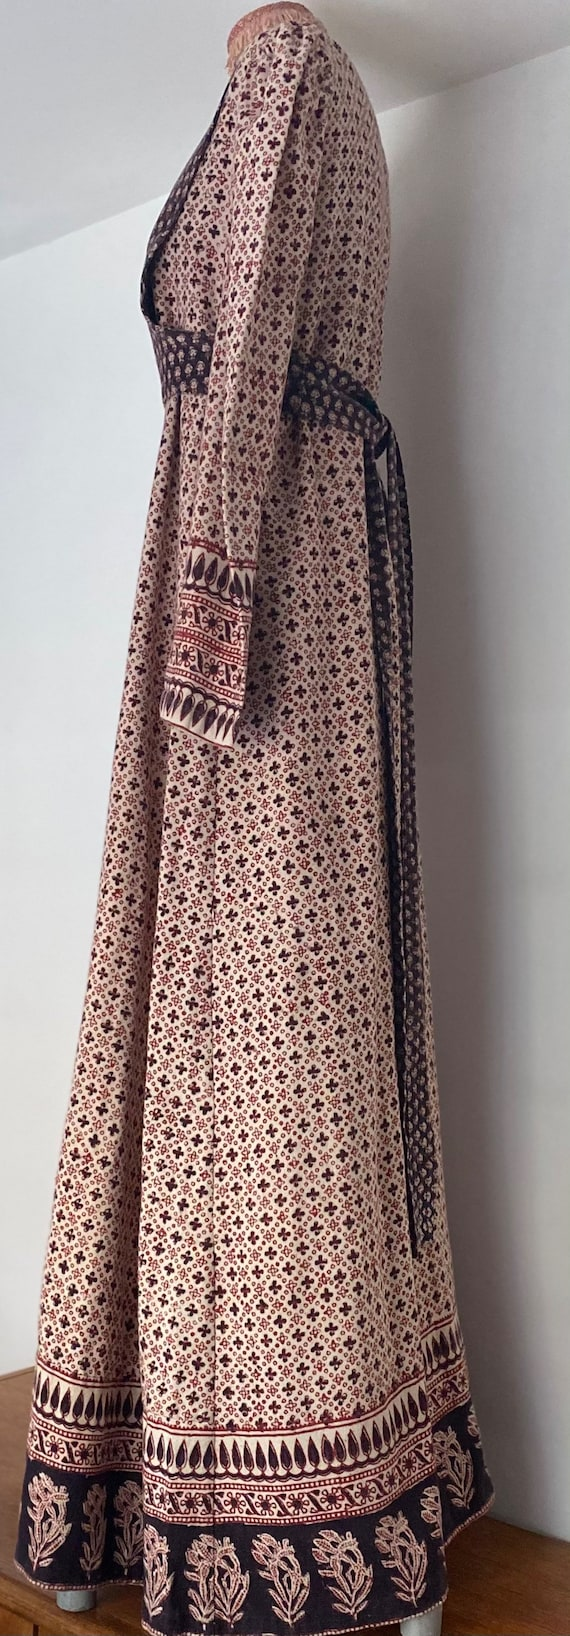 Indian Cotton 70s Long Prairie Dress - image 4